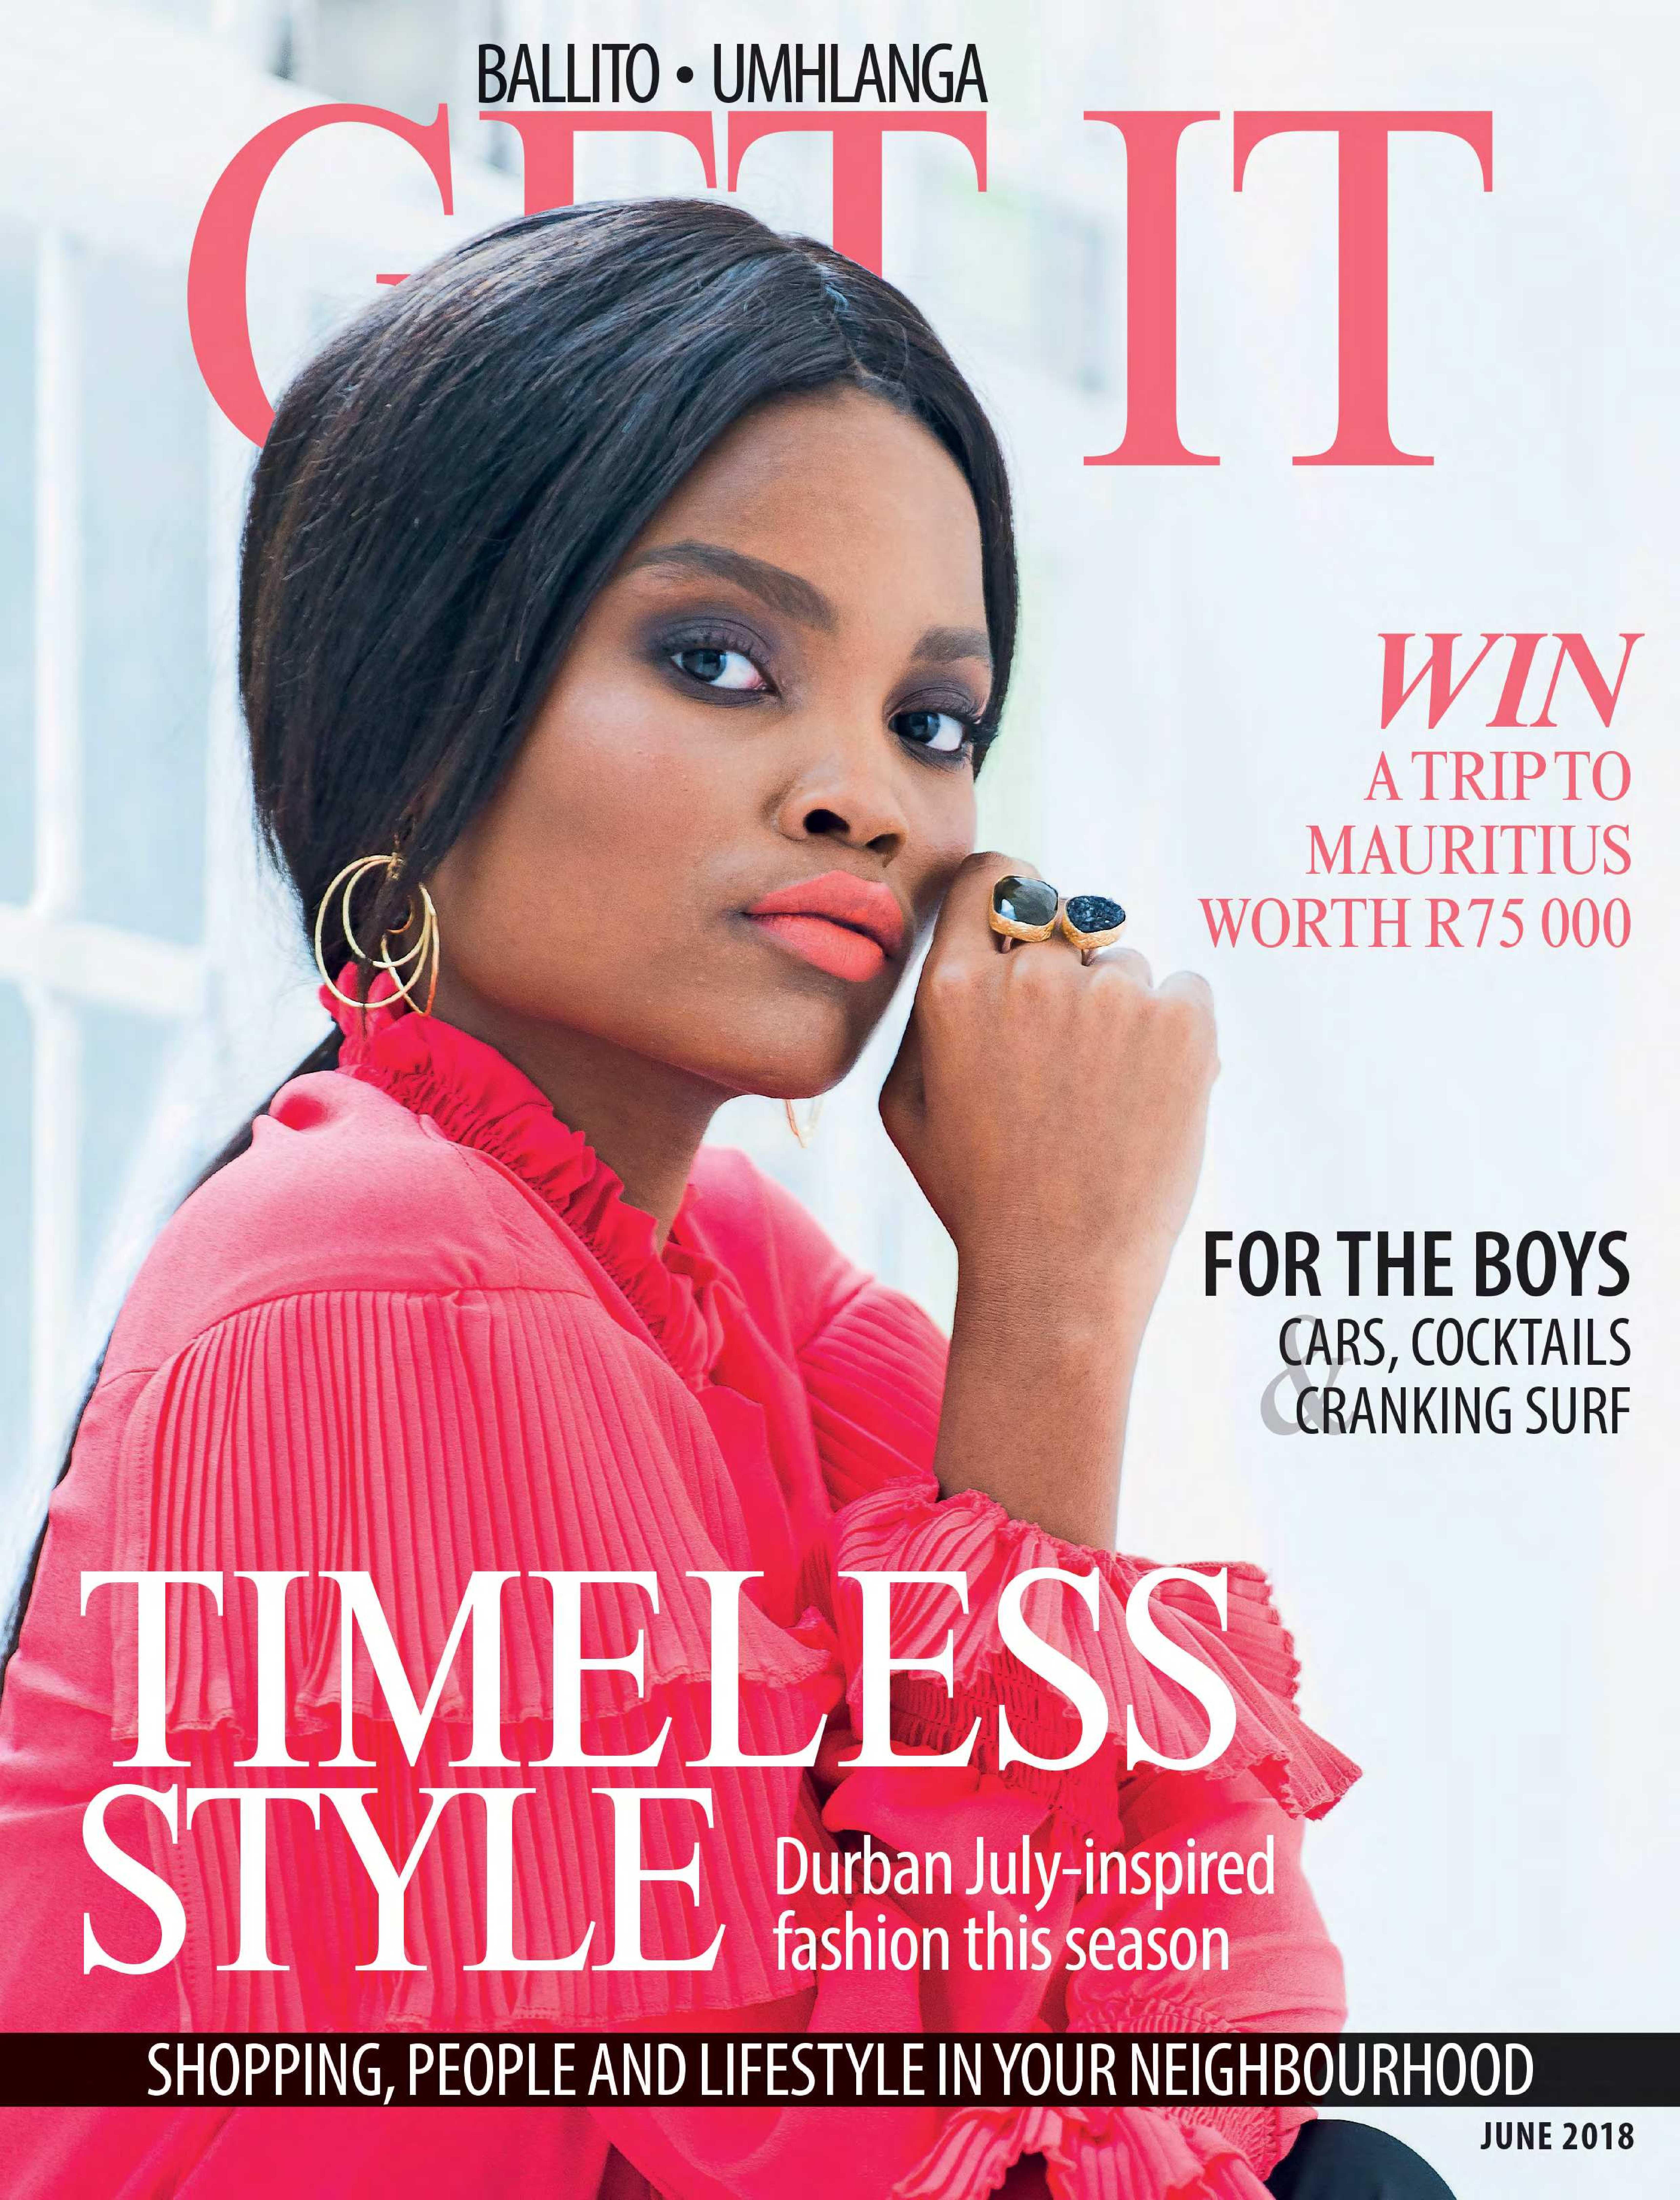 get-magazine-ballitoumhlanga-june-2018-epapers-page-1